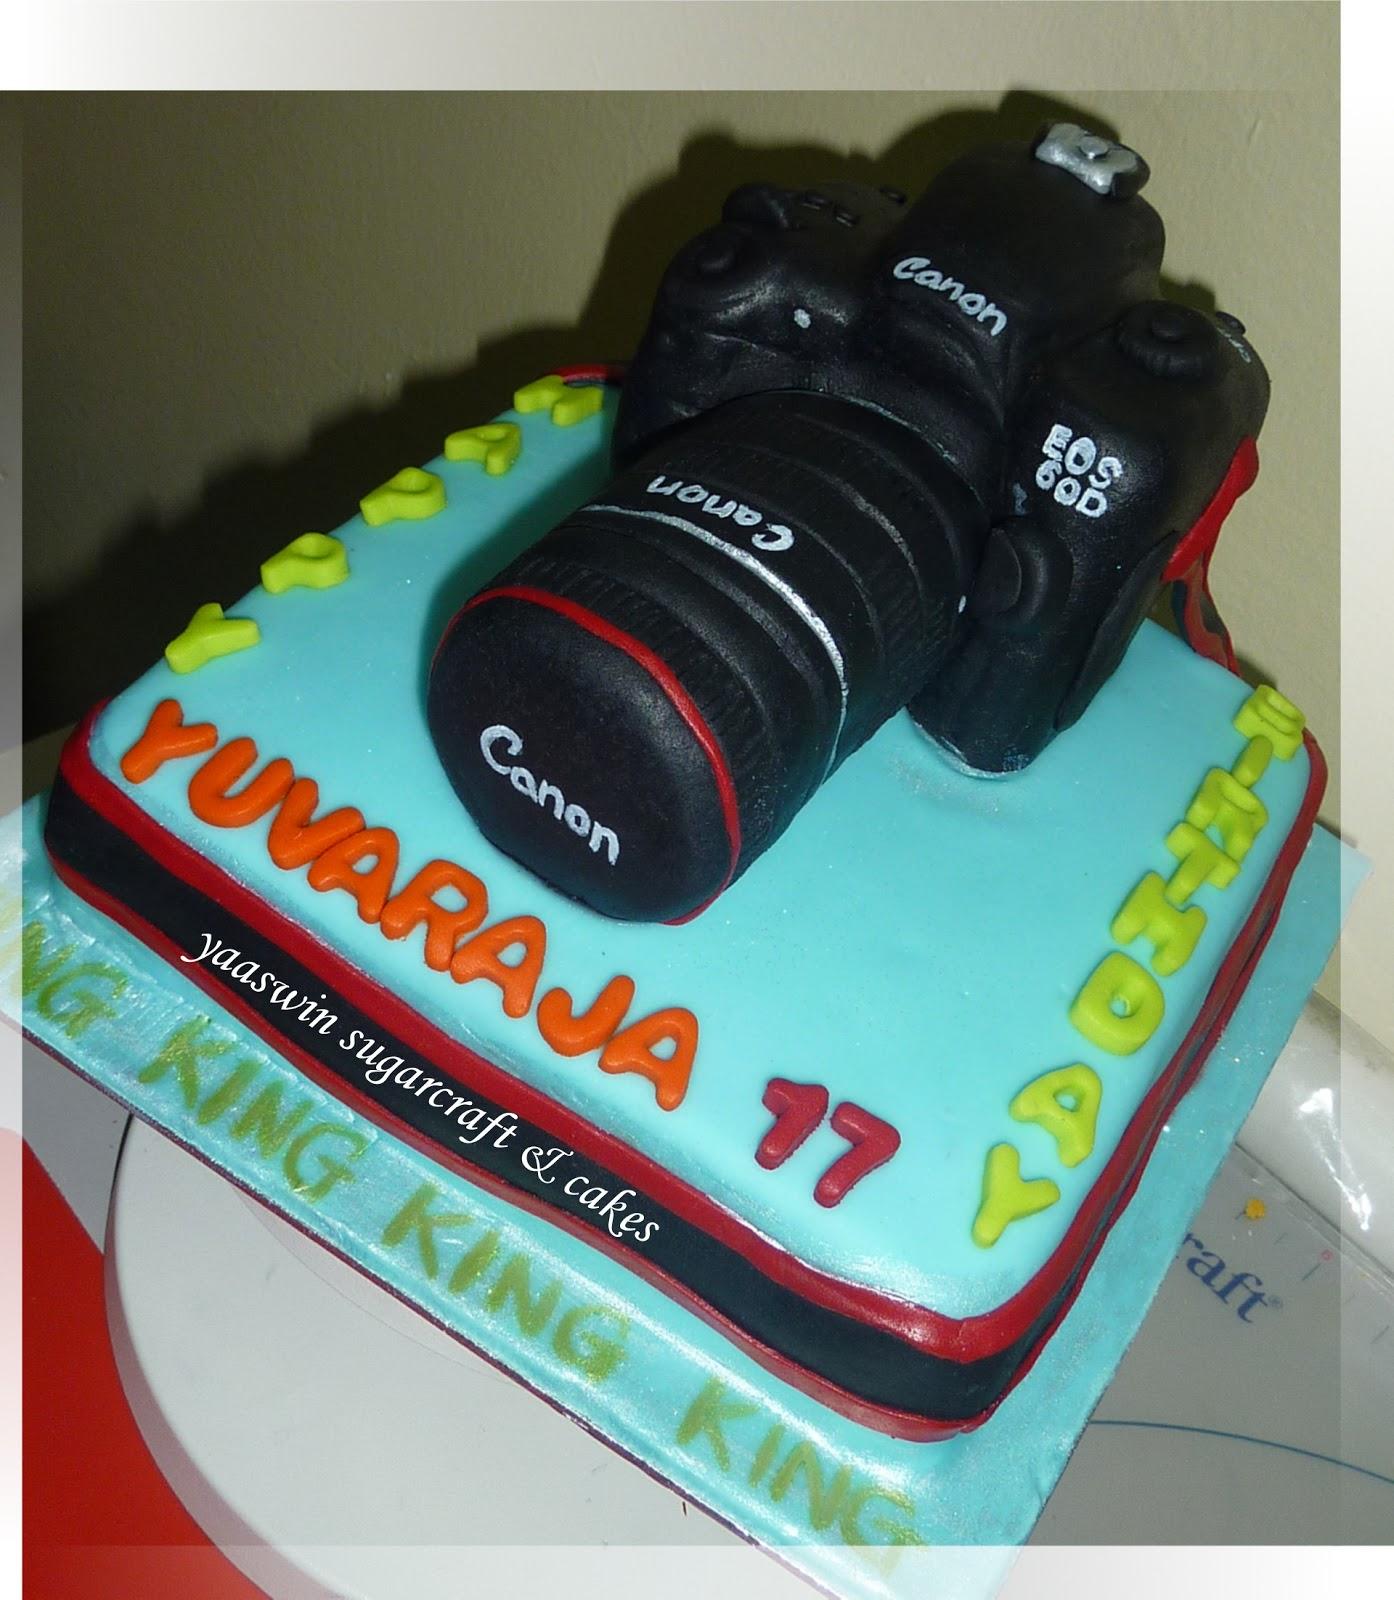 Canon Camera 60D Chocolate & Vanilla Cake